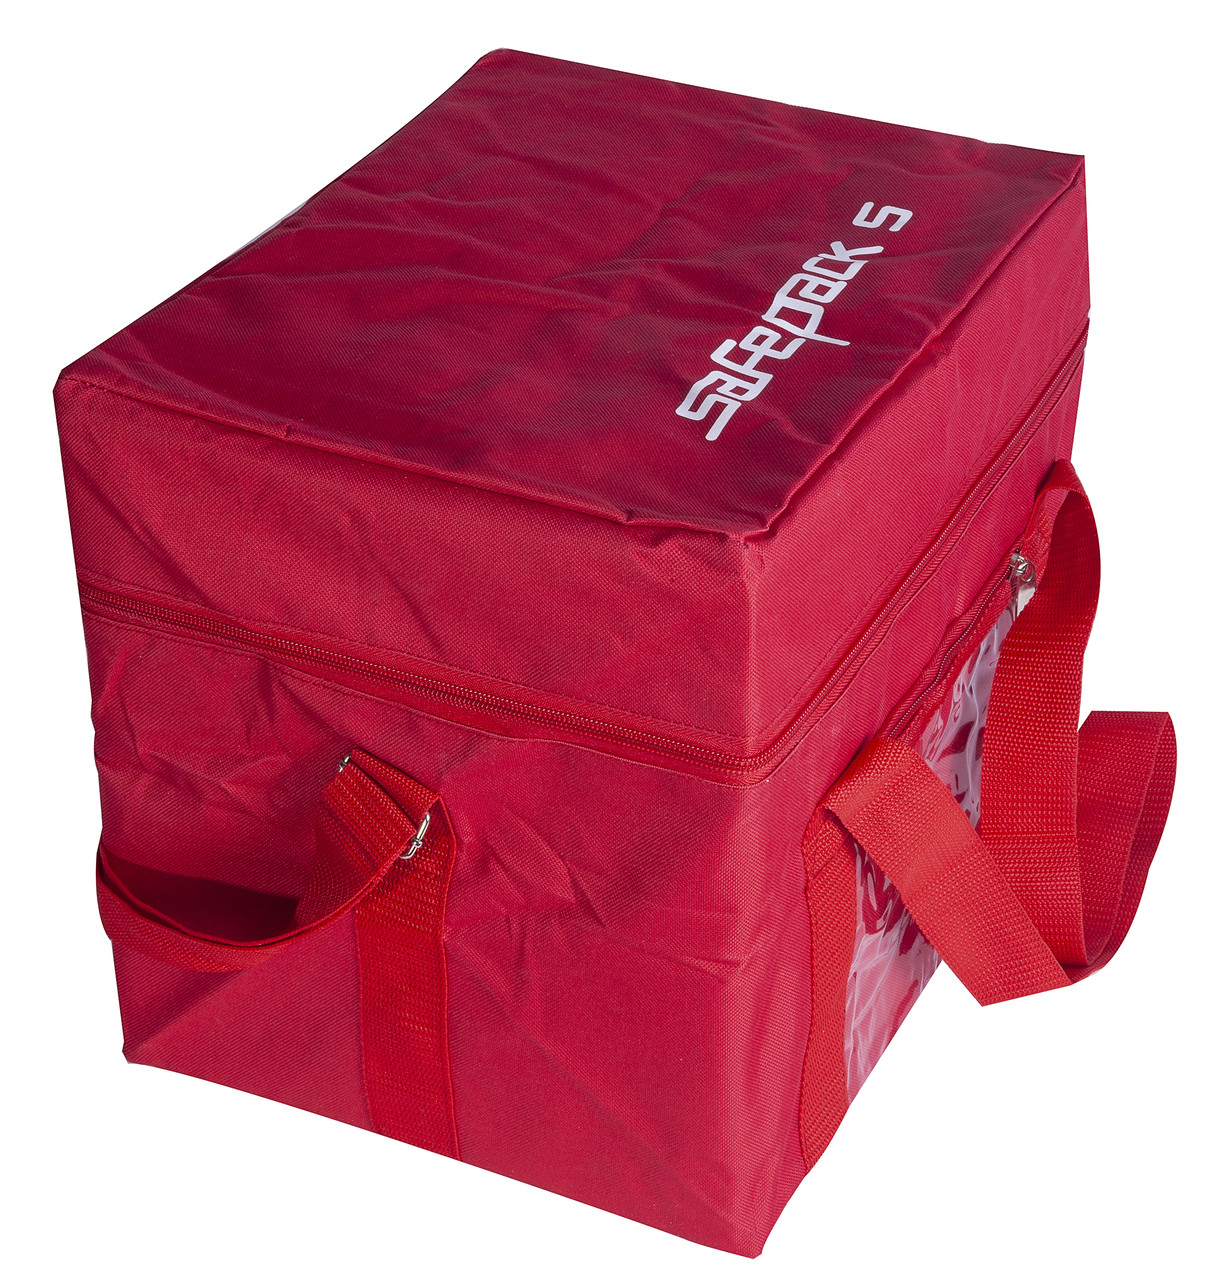 Термоконтейнер СейфПак СП-5 PPU + сумка-чехол + 10 хладоэлементов Тип-1 СП Plus -15-25